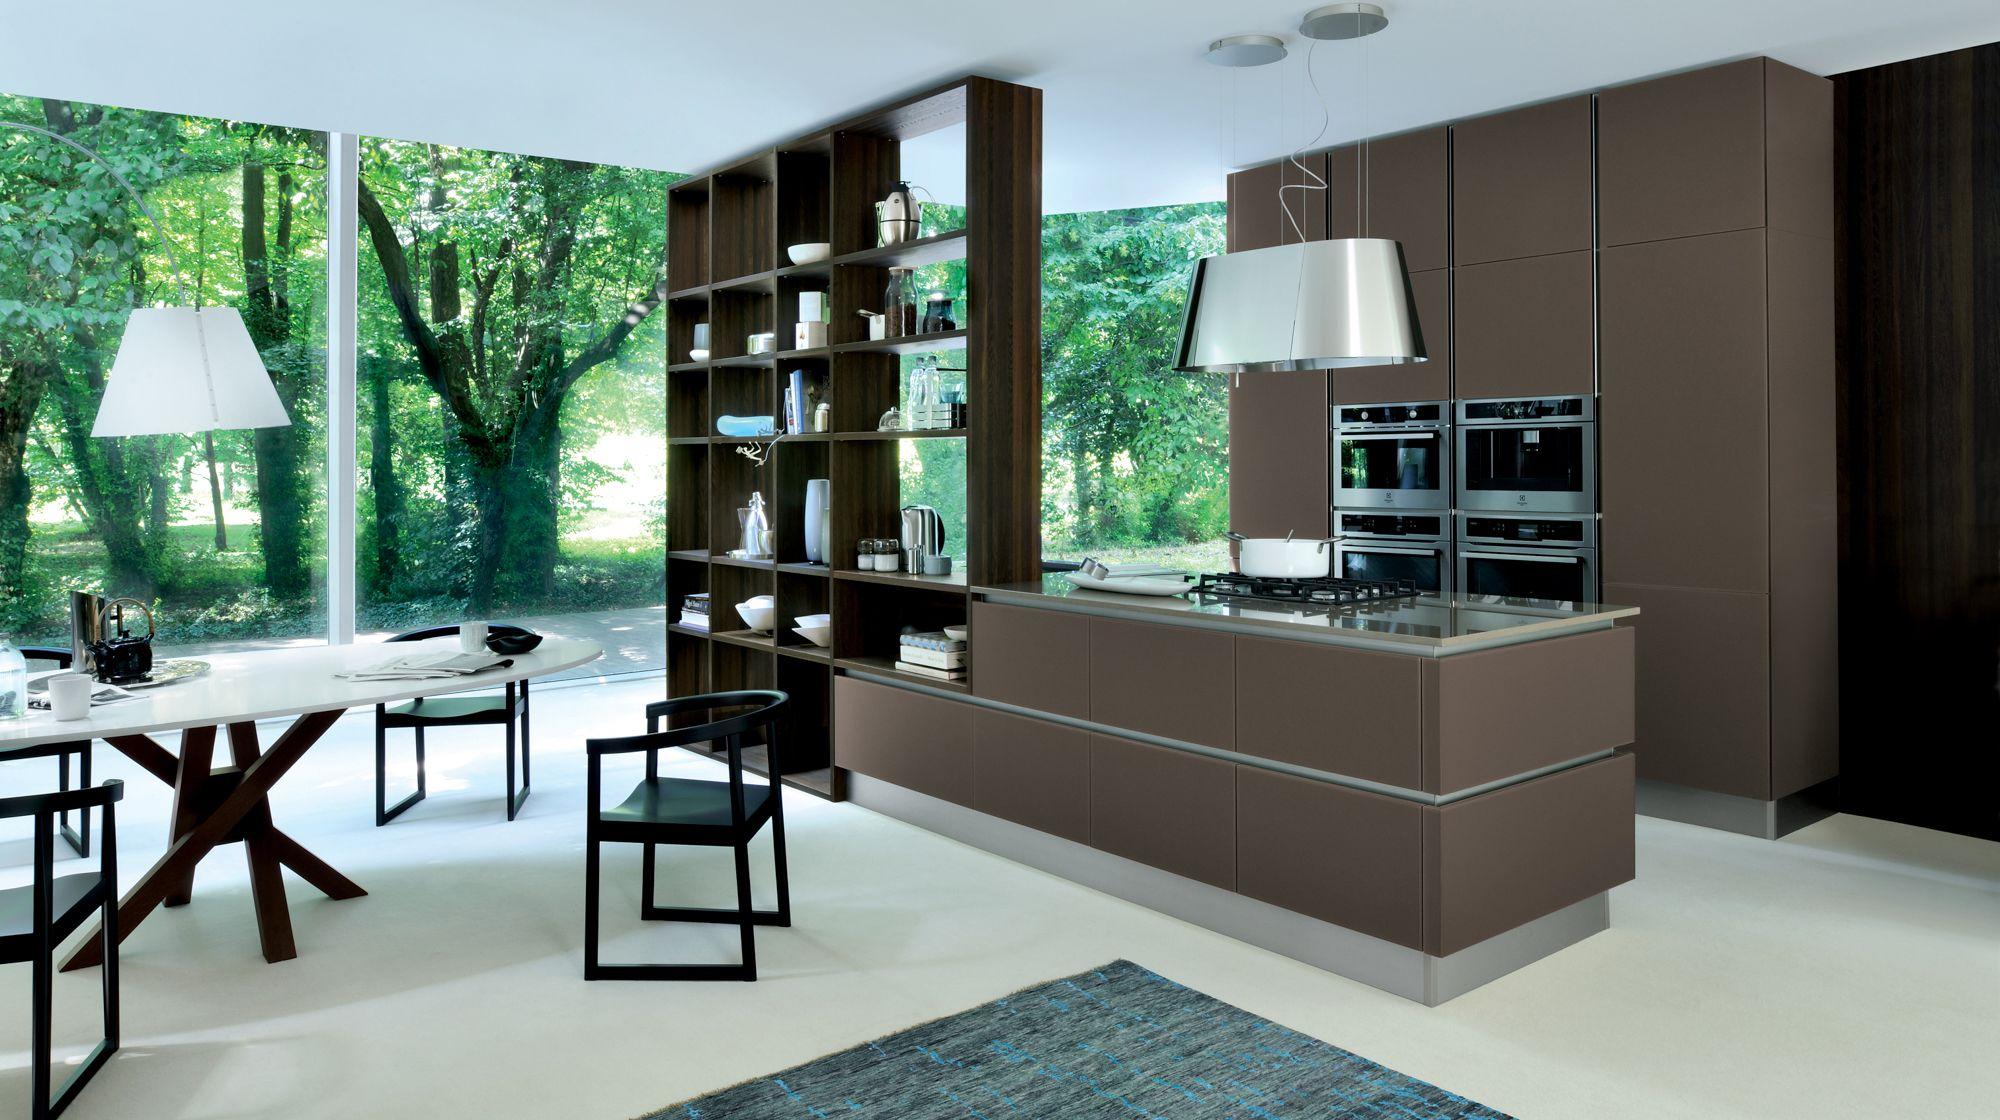 Cucina Ri-flex Essence | Veneta Cucine | CUCINE | Pinterest ...